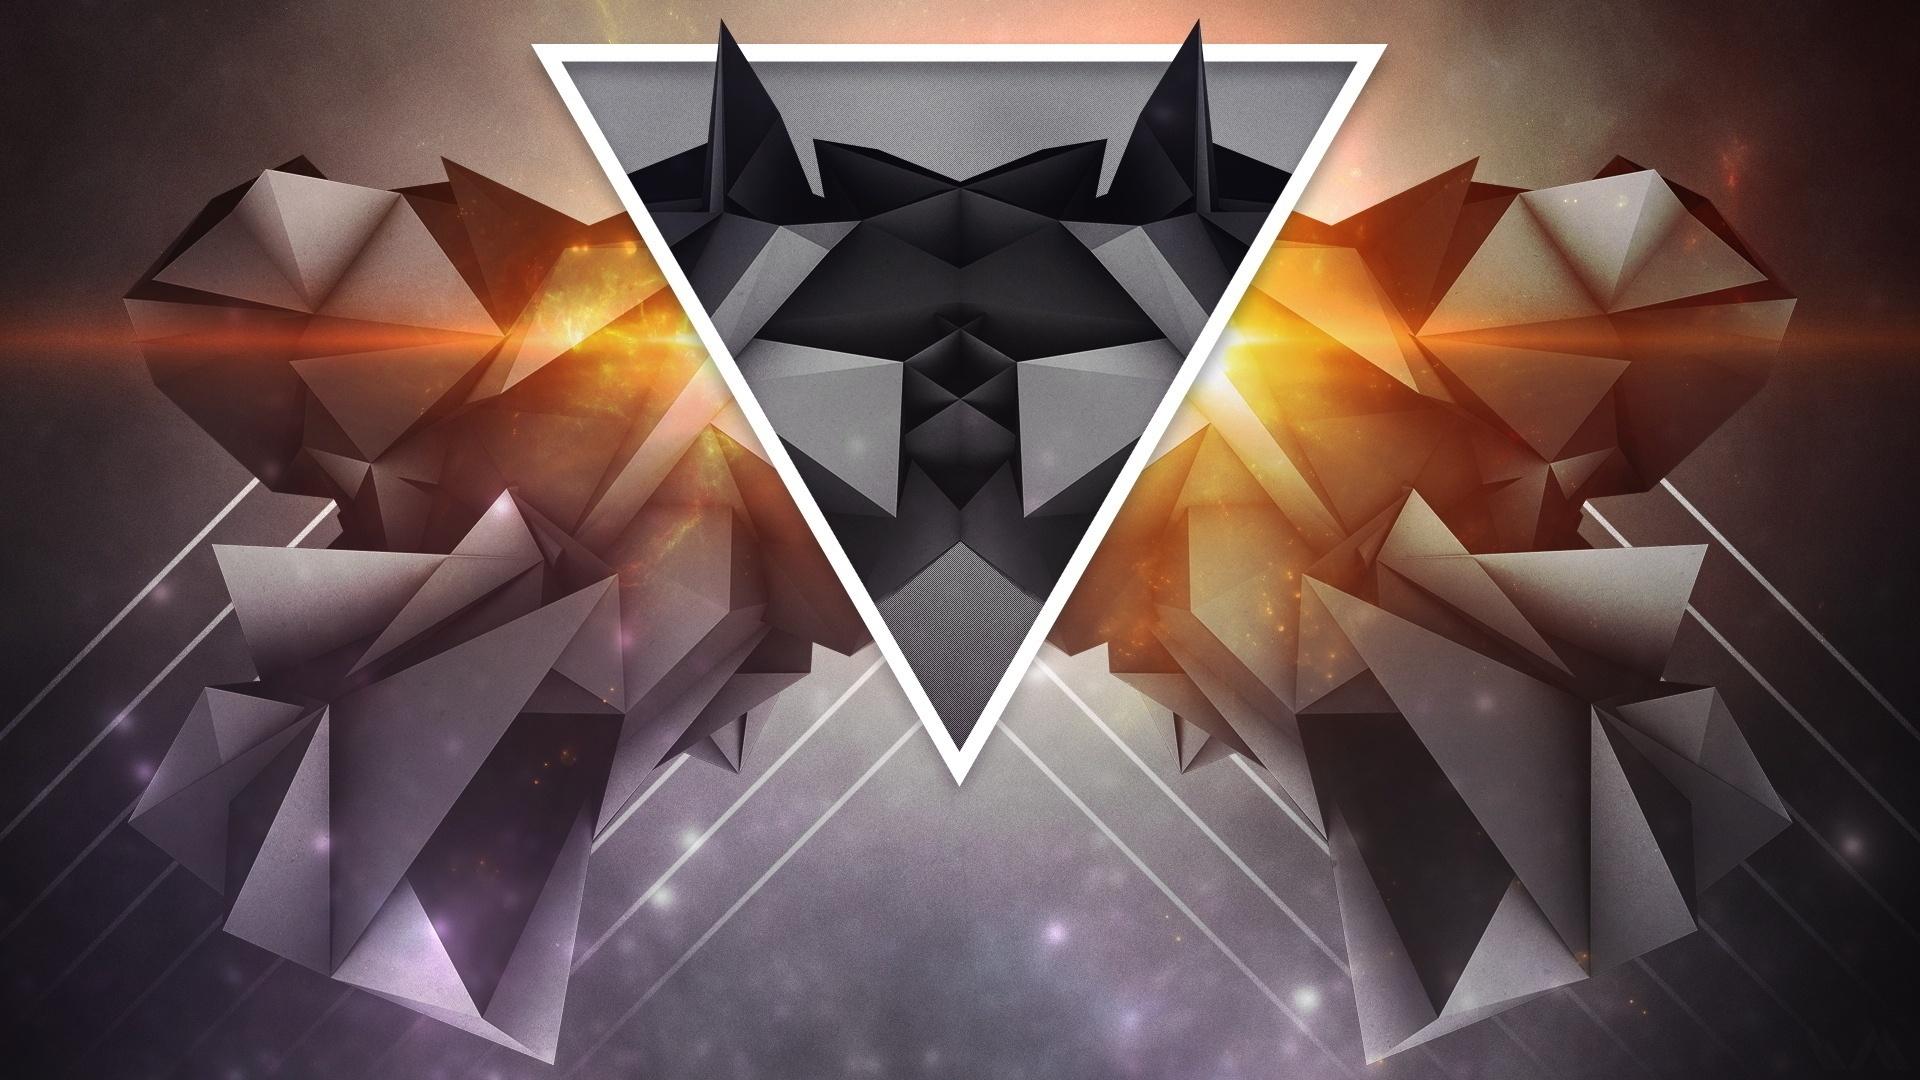 Shapes Triangle desktop wallpaper hd